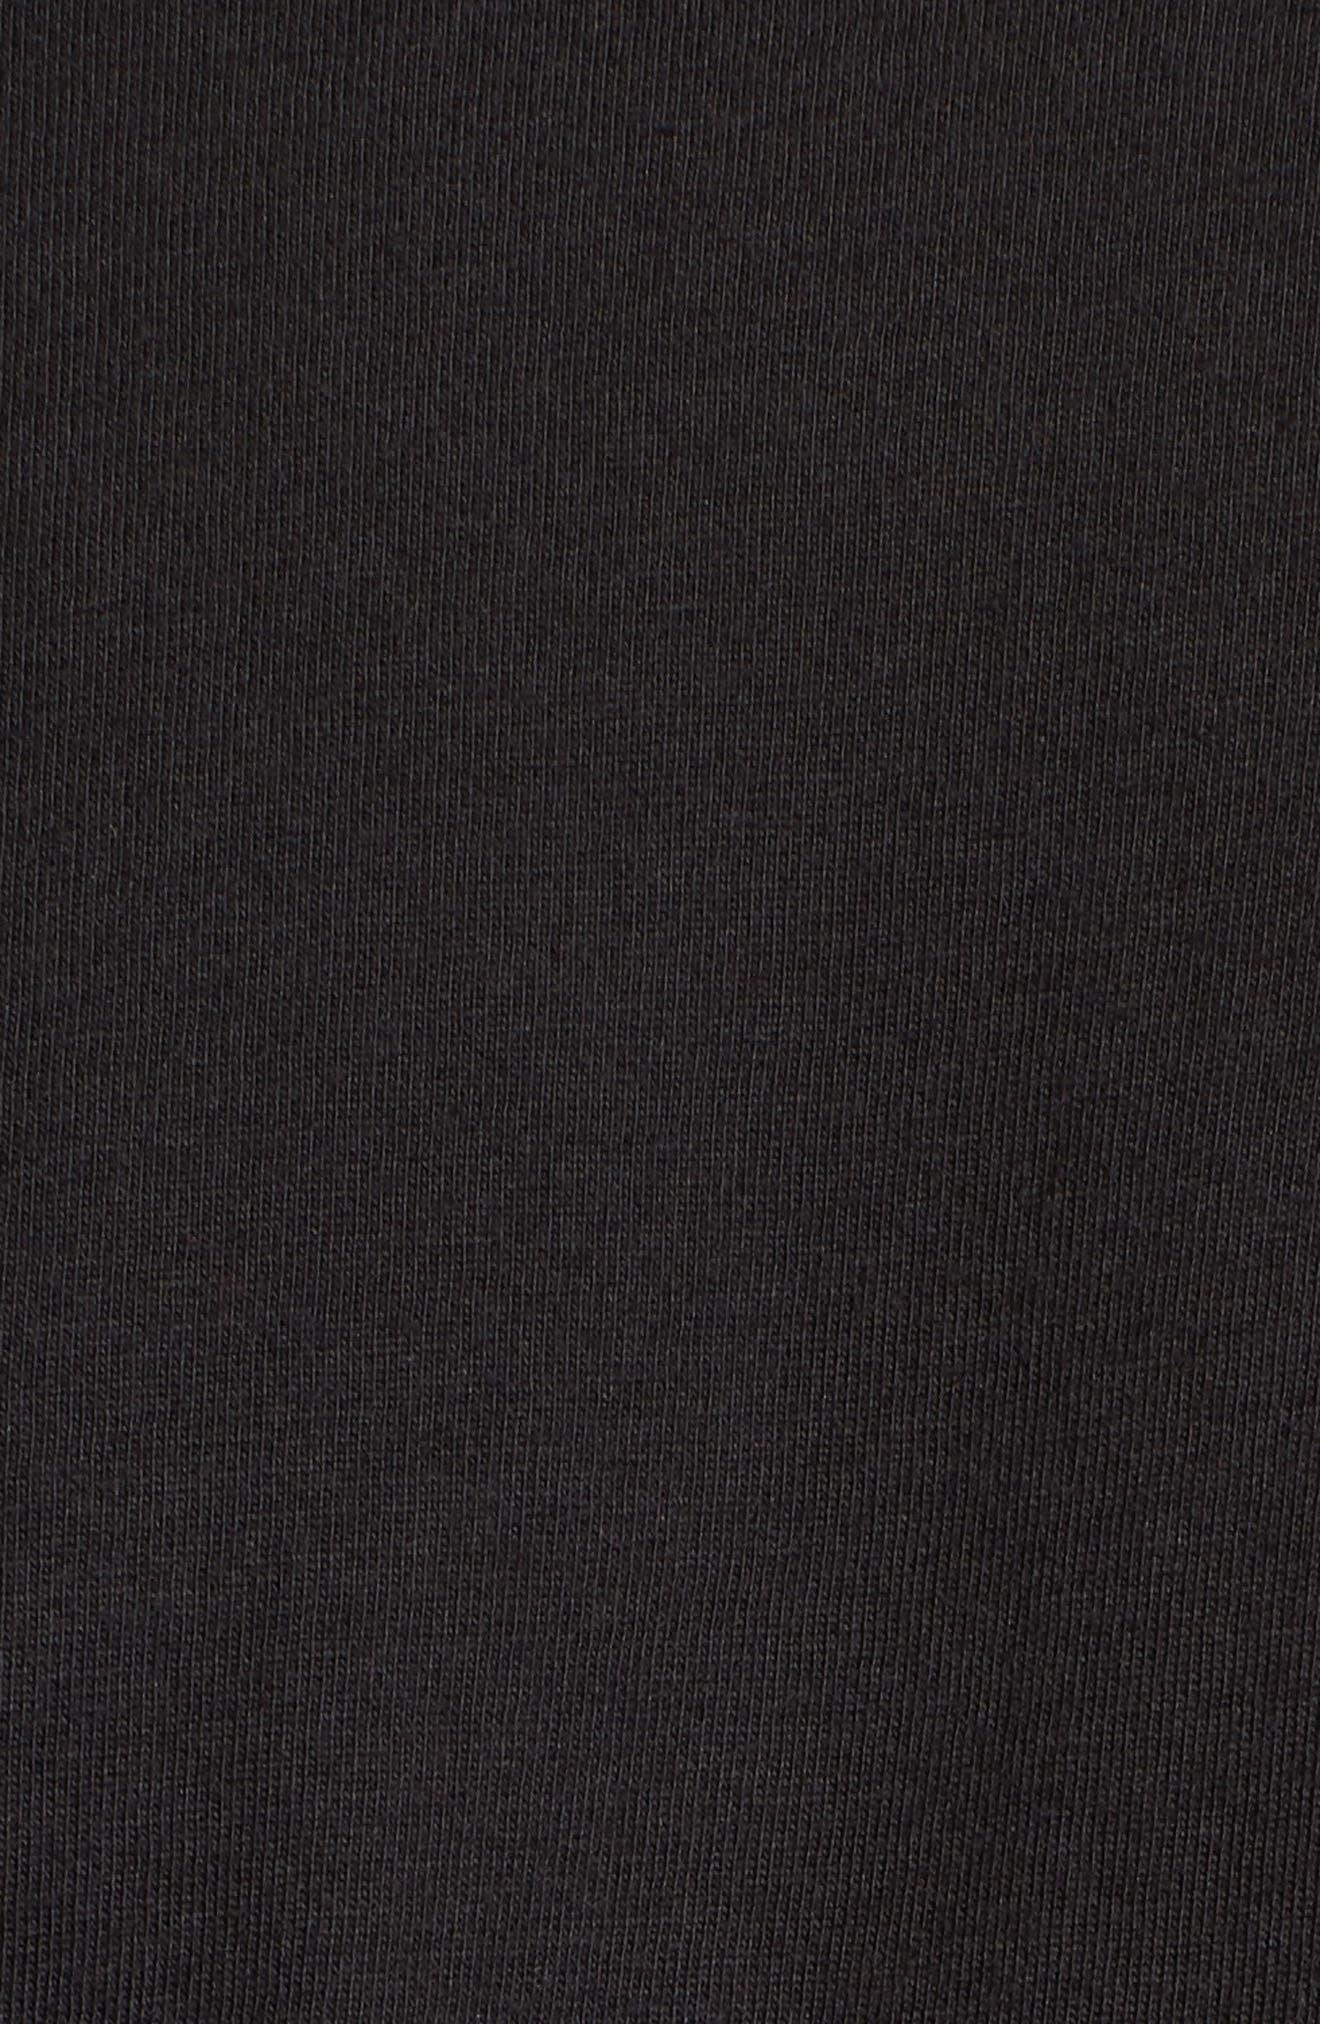 Surfin' Bird T-Shirt,                             Alternate thumbnail 5, color,                             Black